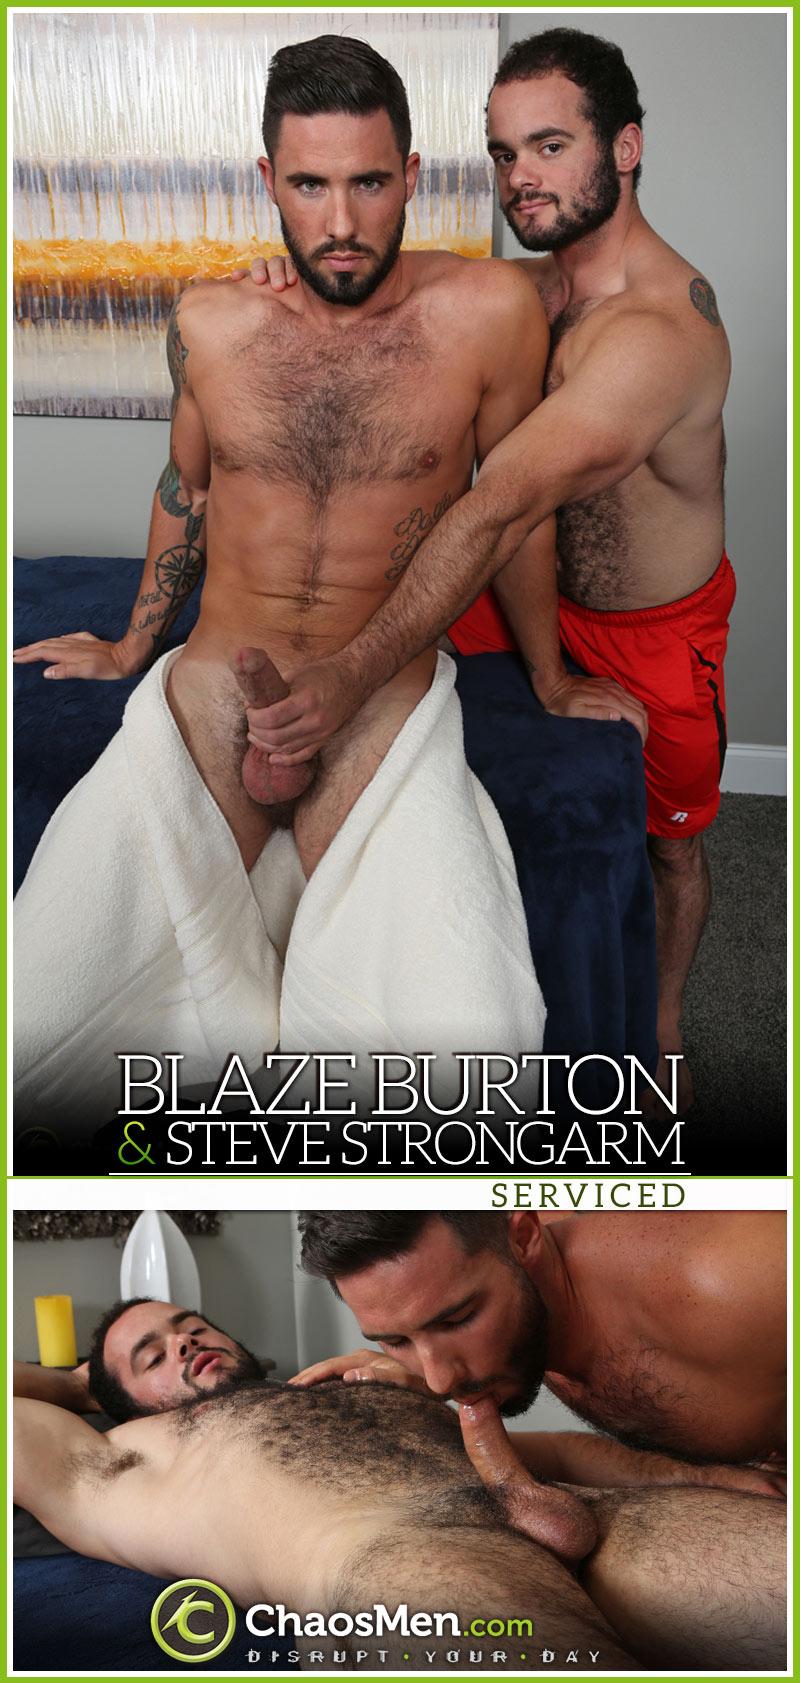 Blaze Burton & Steve Strongarm 'Serviced' at ChaosMen